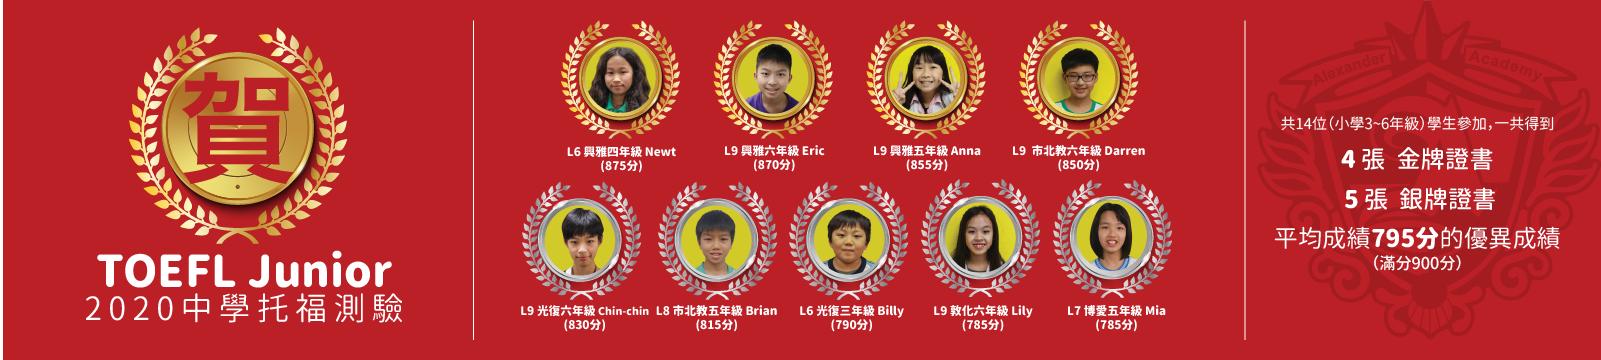 2020年TOFEL Junior中學生托福測驗